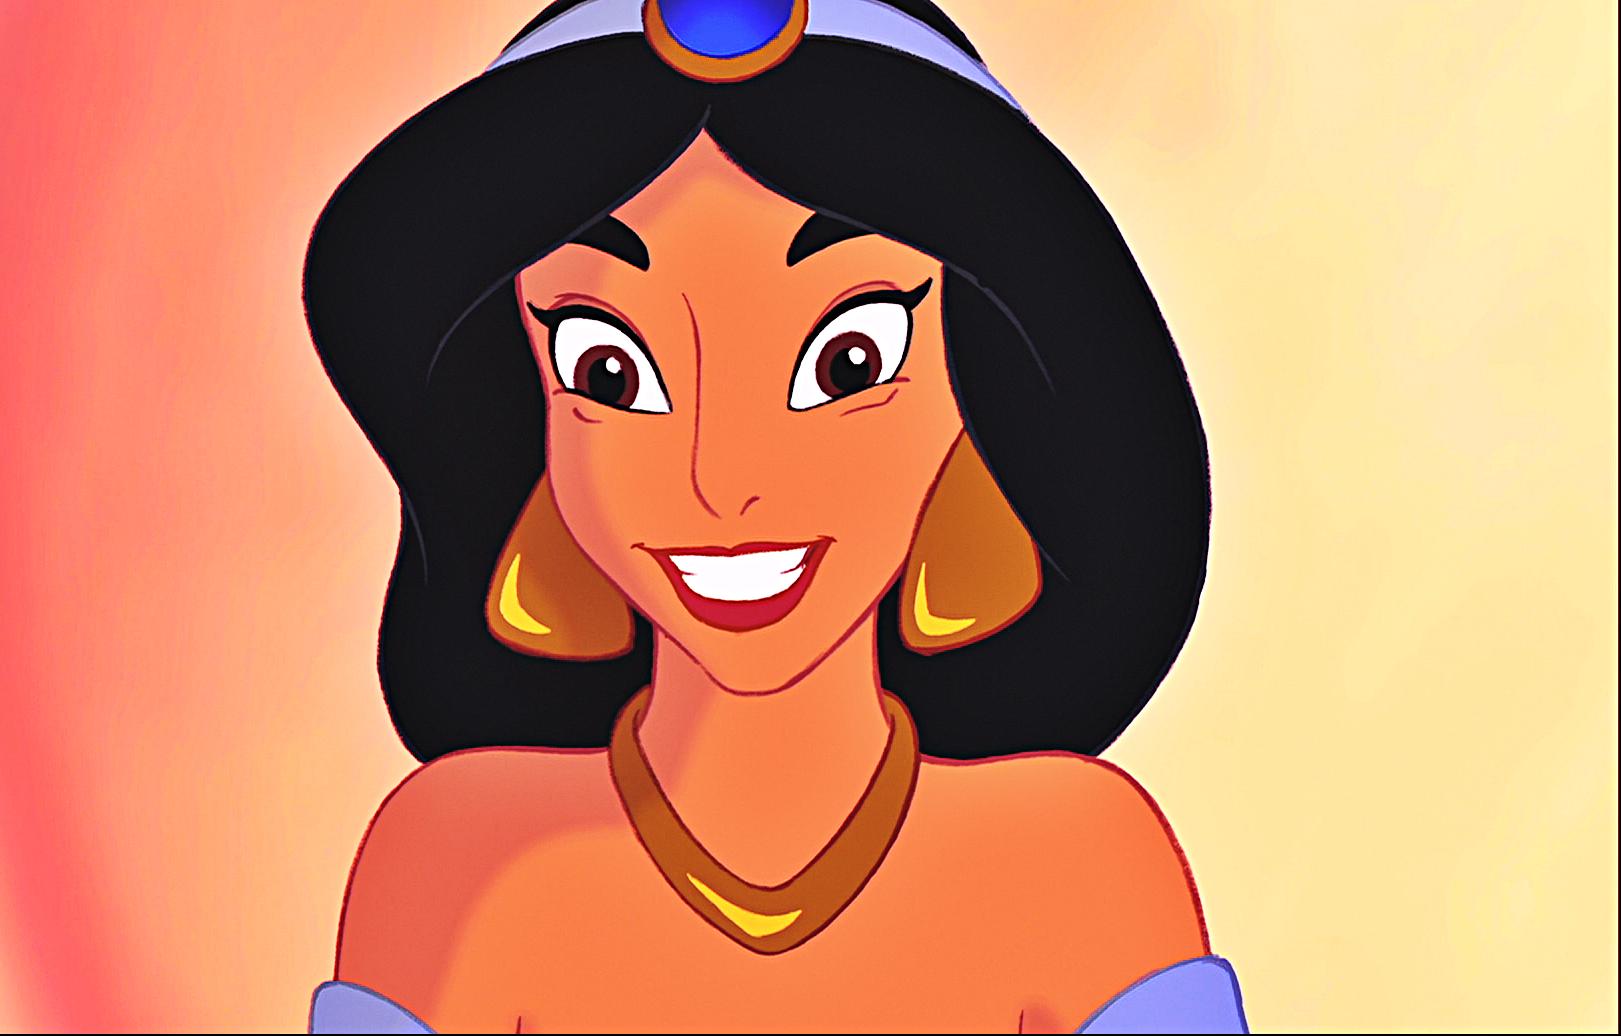 Walt 迪士尼 - Princess 茉莉, 茉莉花